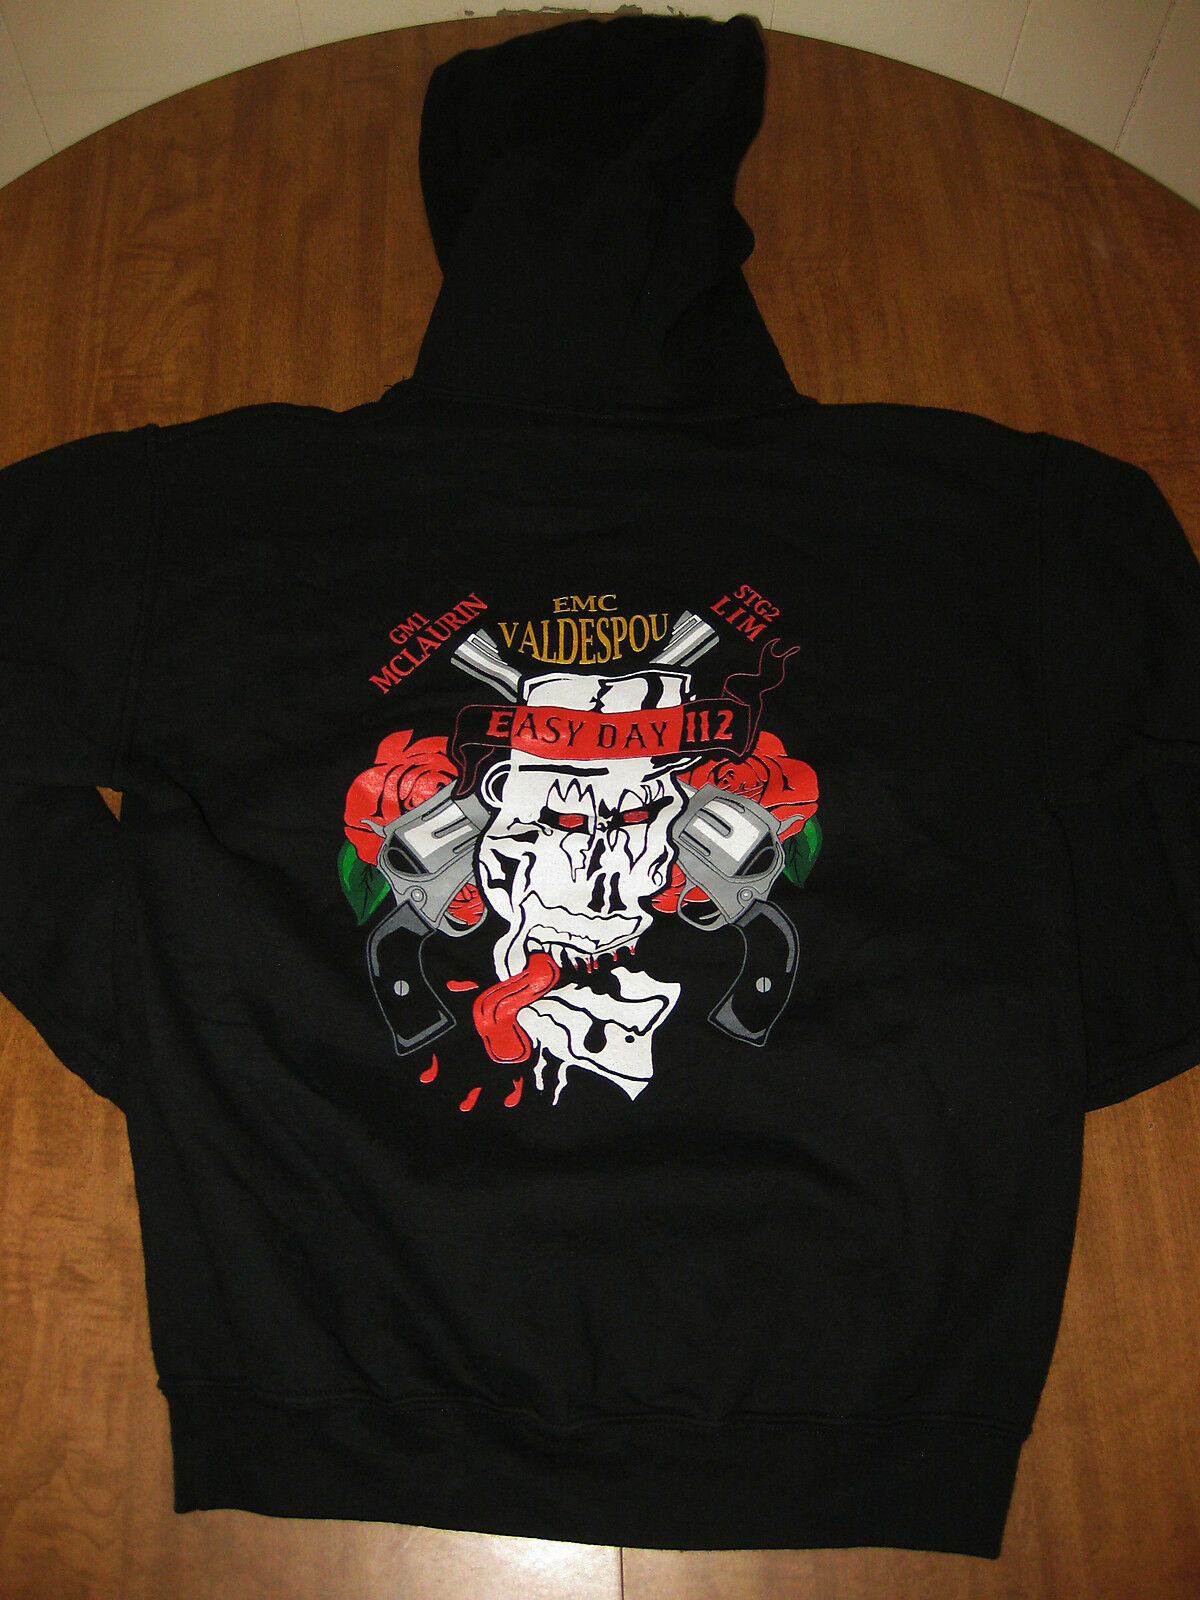 US NAVY small hoodie Gunner's Mate First Class hooded sweatshirt EMC